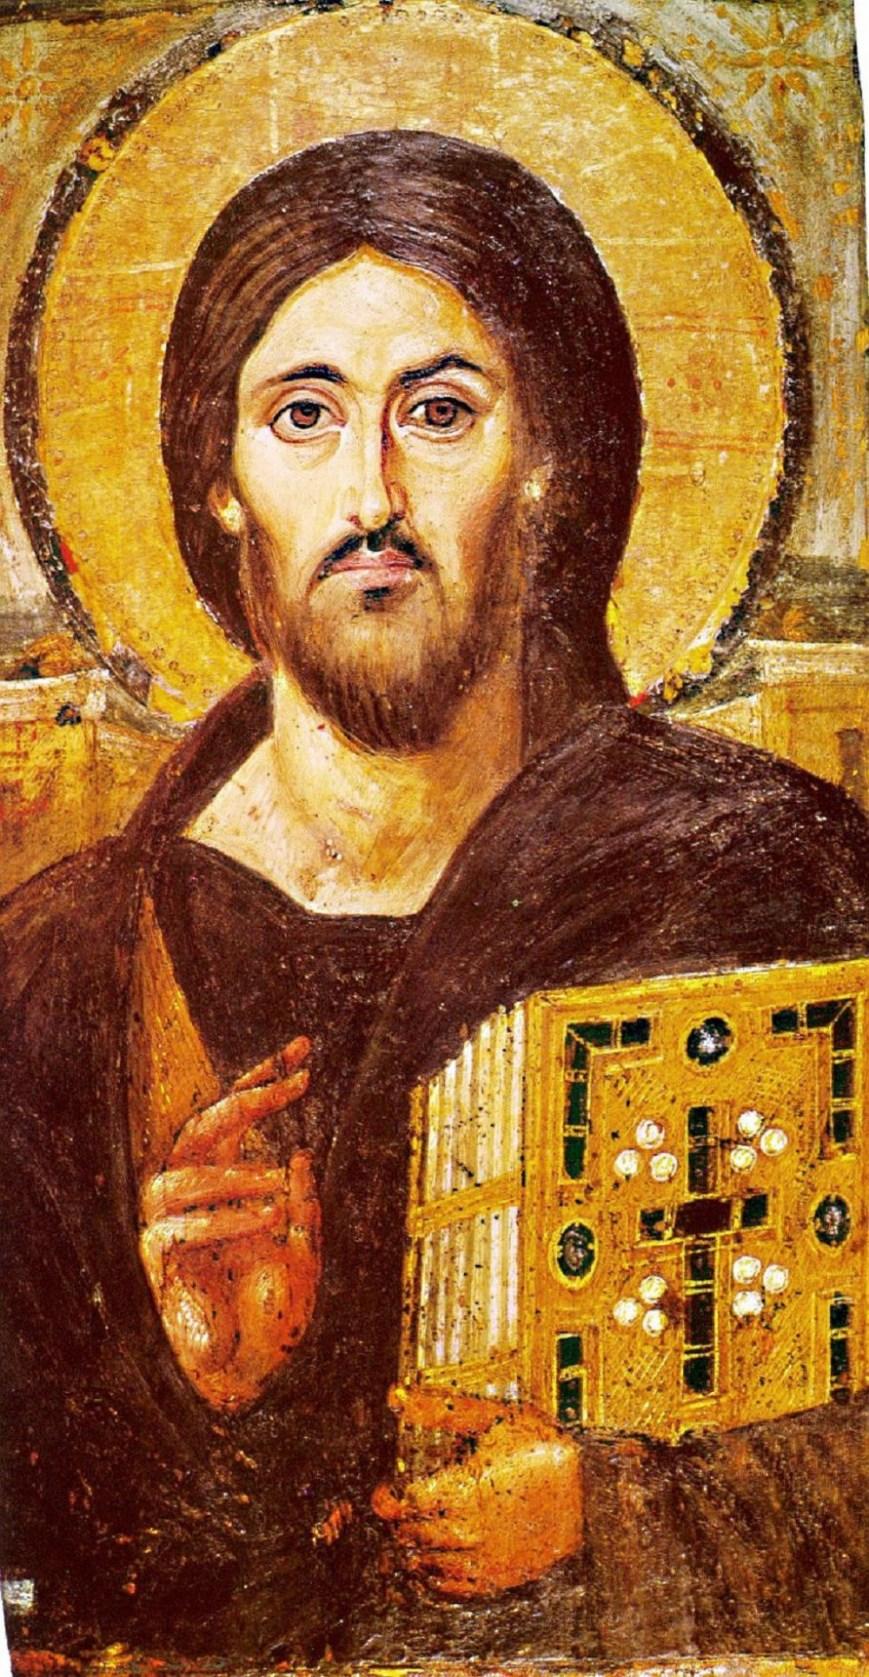 unknown-artist-christ-pantocrator-st-catherine-monastery-mount-sinai-egypt-6th-century-e1277330981153